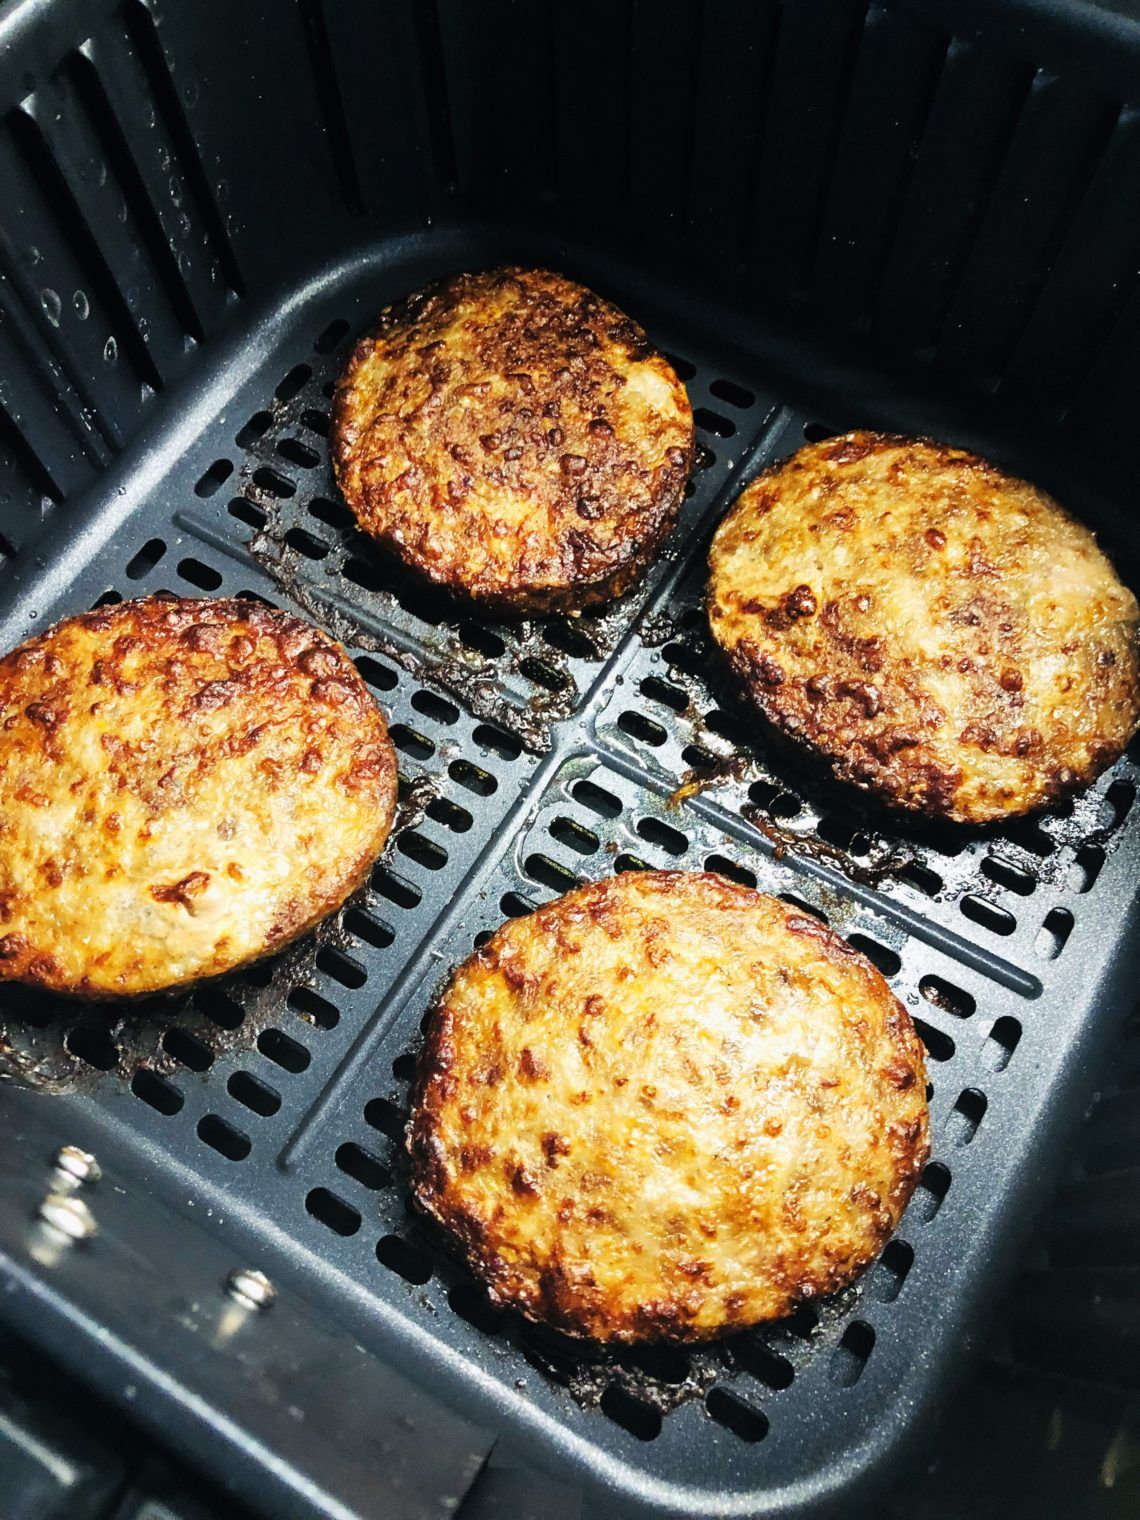 Pin on Air fryer dinner recipes